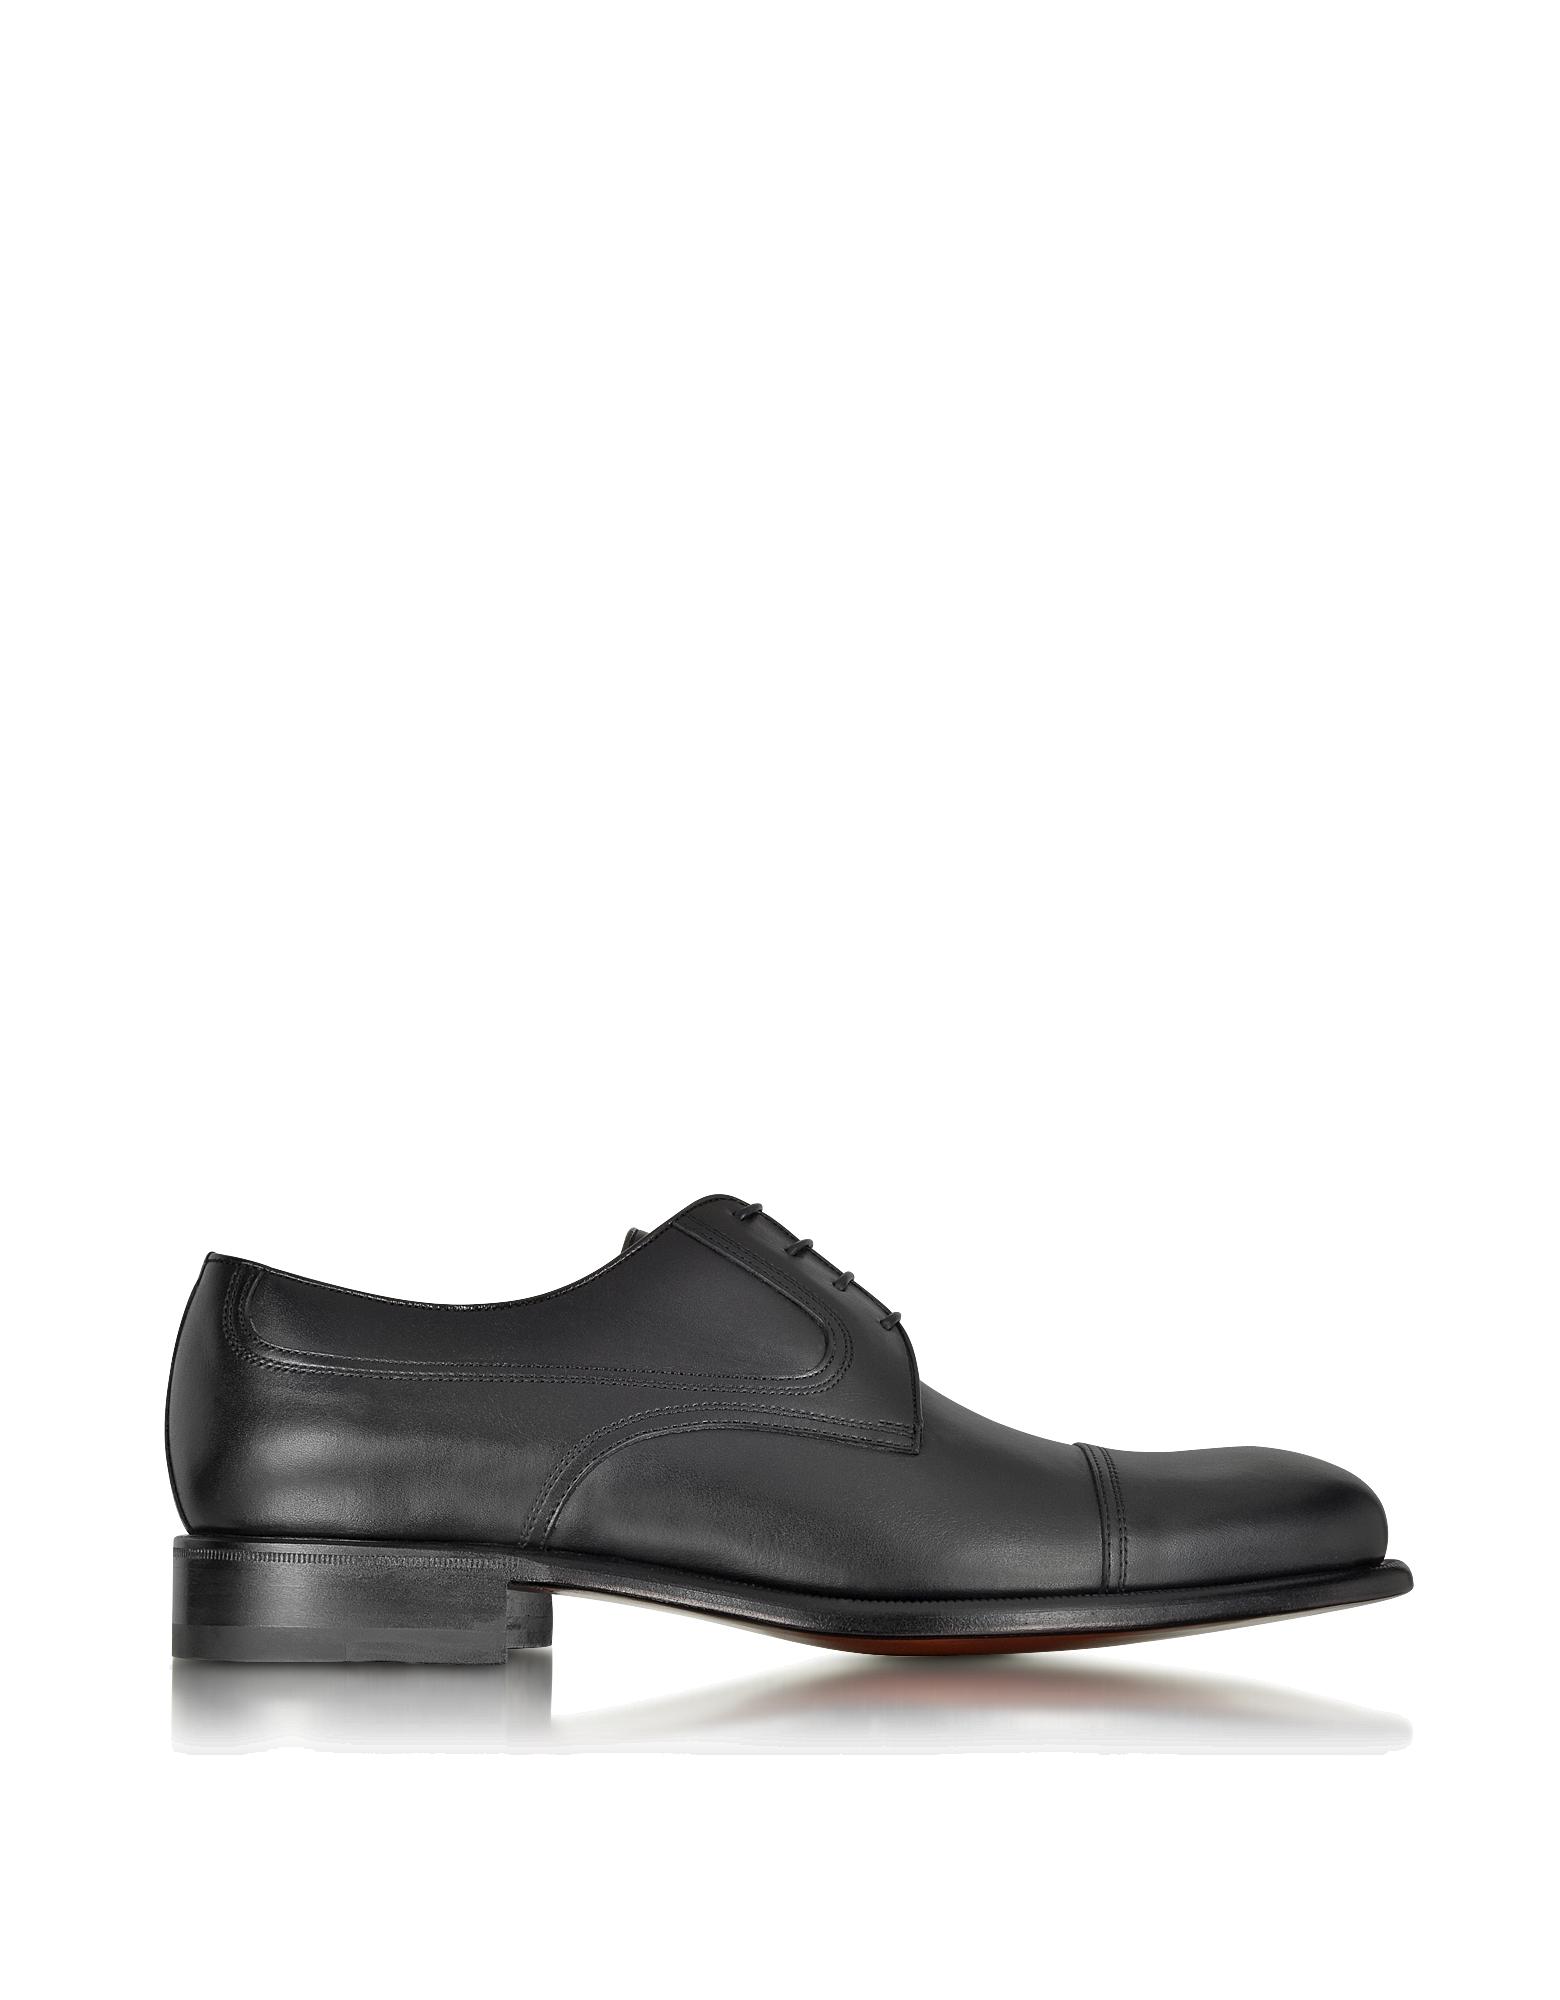 Image of Black Leather Derby Shoe